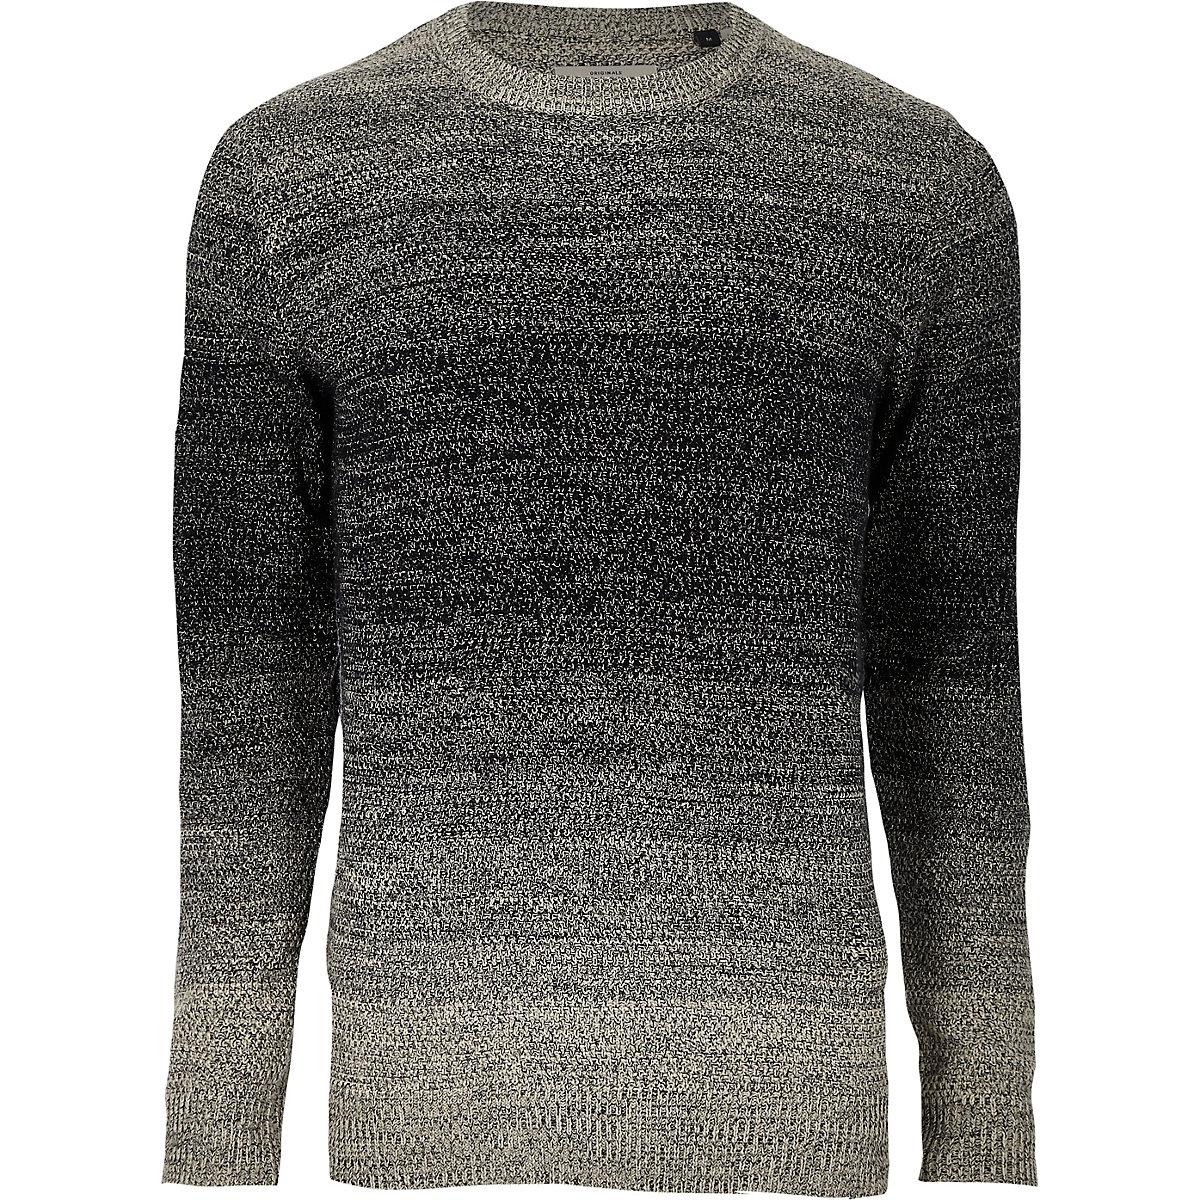 Jack & Jones Originals navy knit jumper